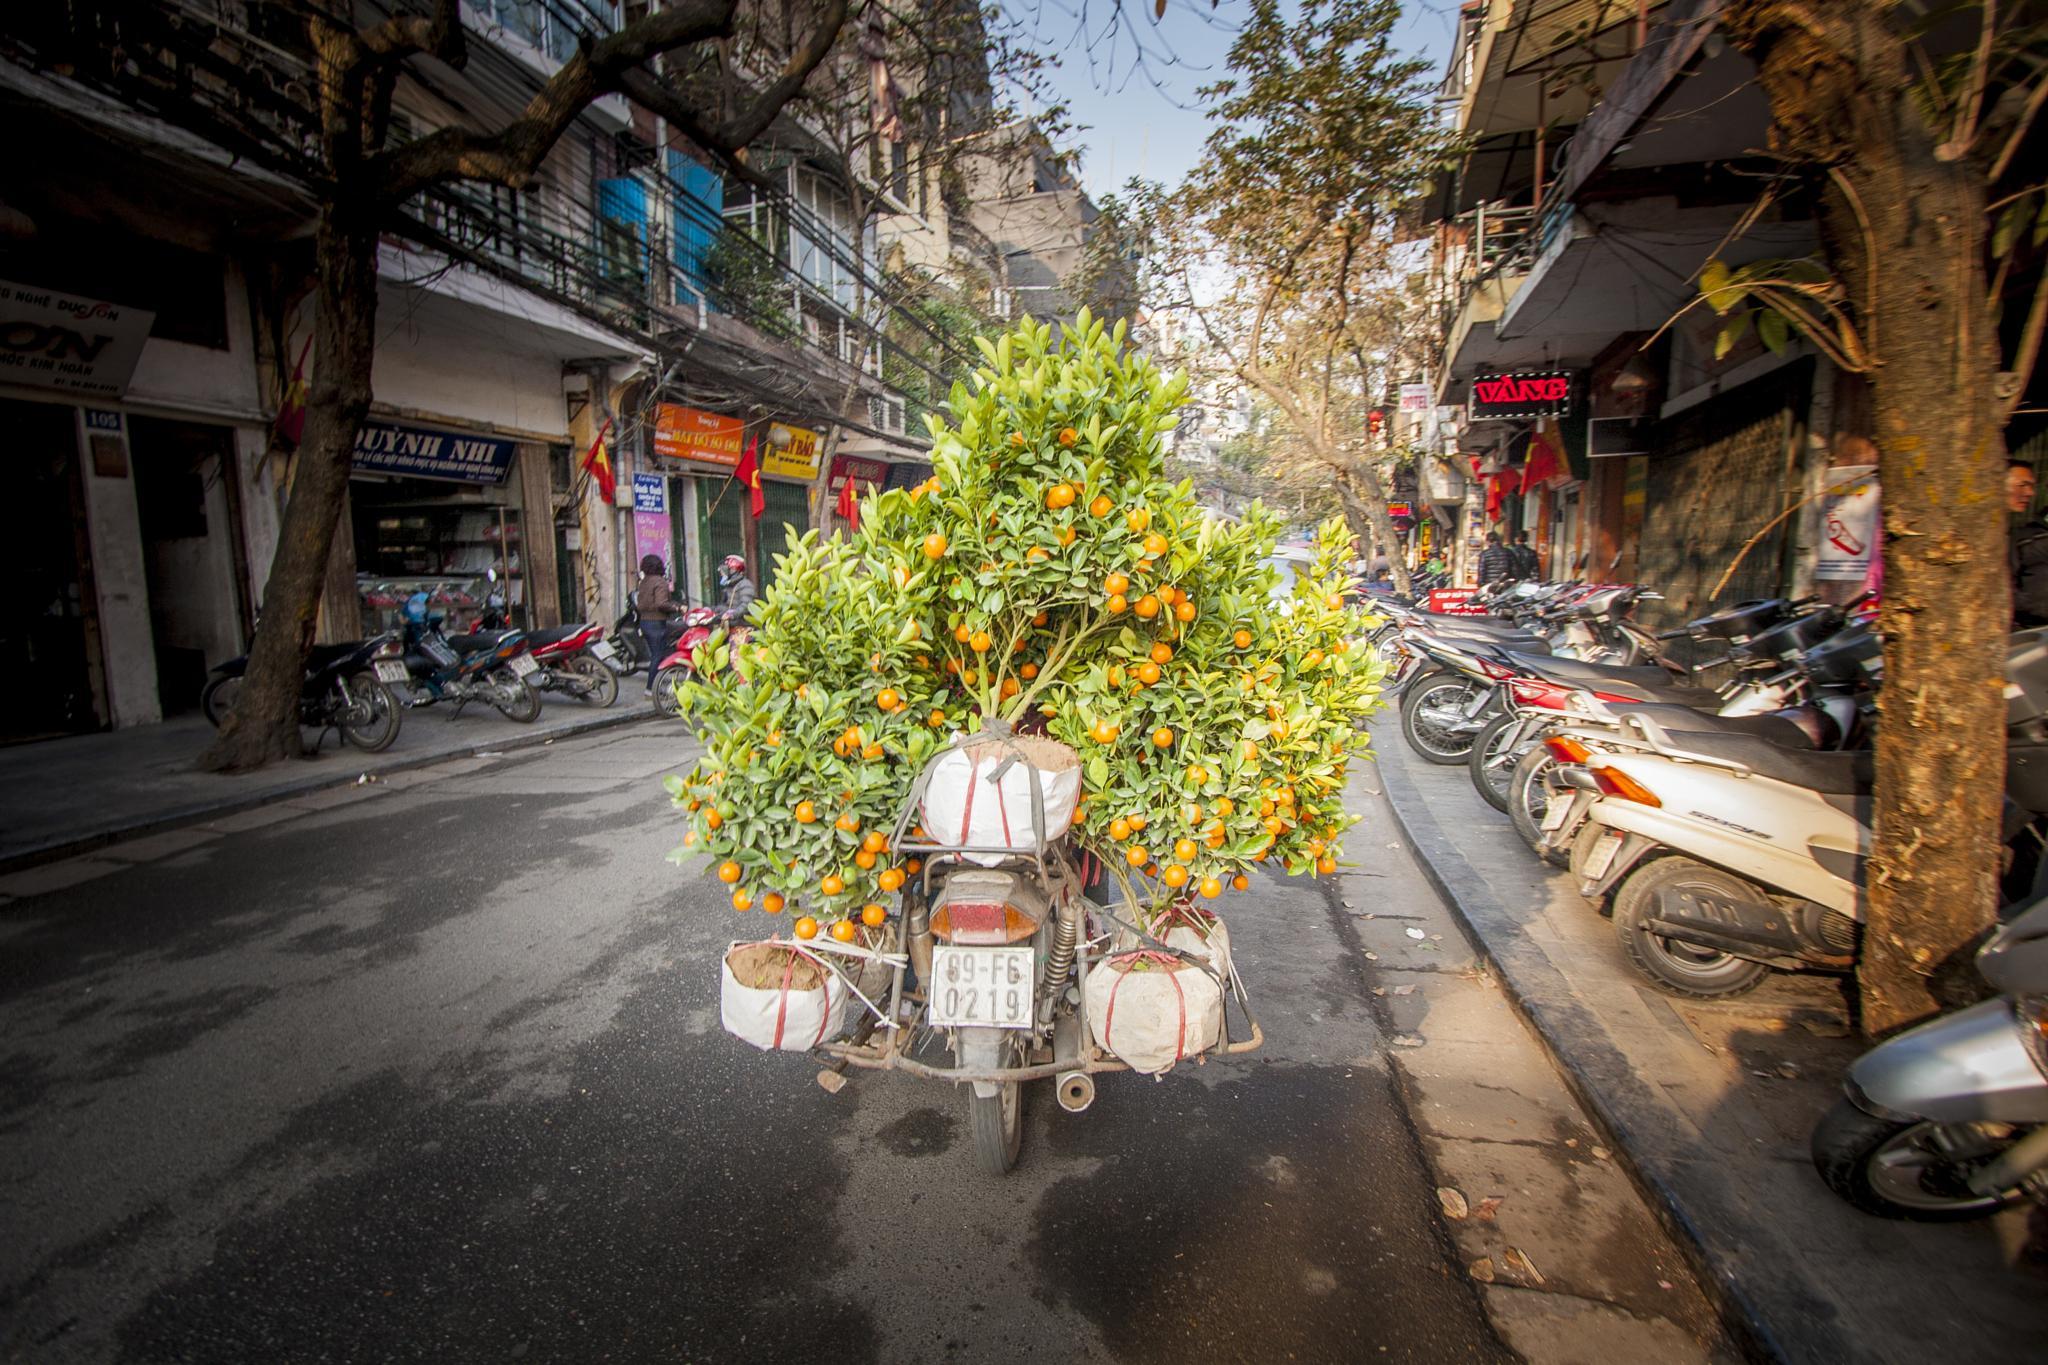 Preparation for Tet - Vietnamese new year by Rafal Krzysiak